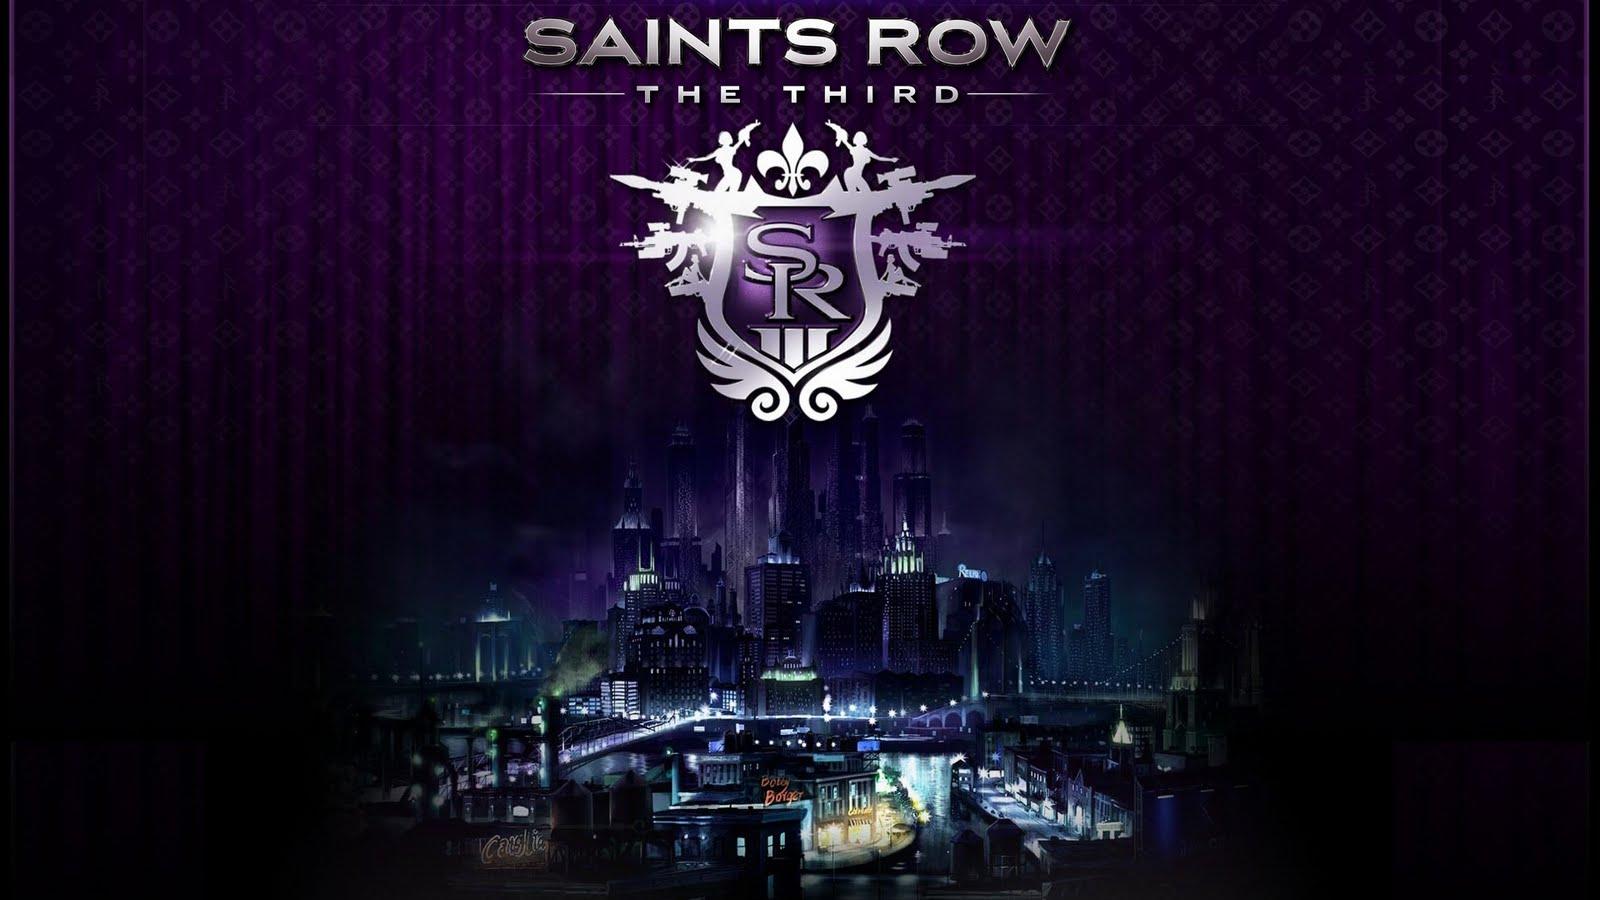 Saint Row 3 Cheats: Saint Row Third Cheats for Xbox 360 and PS3